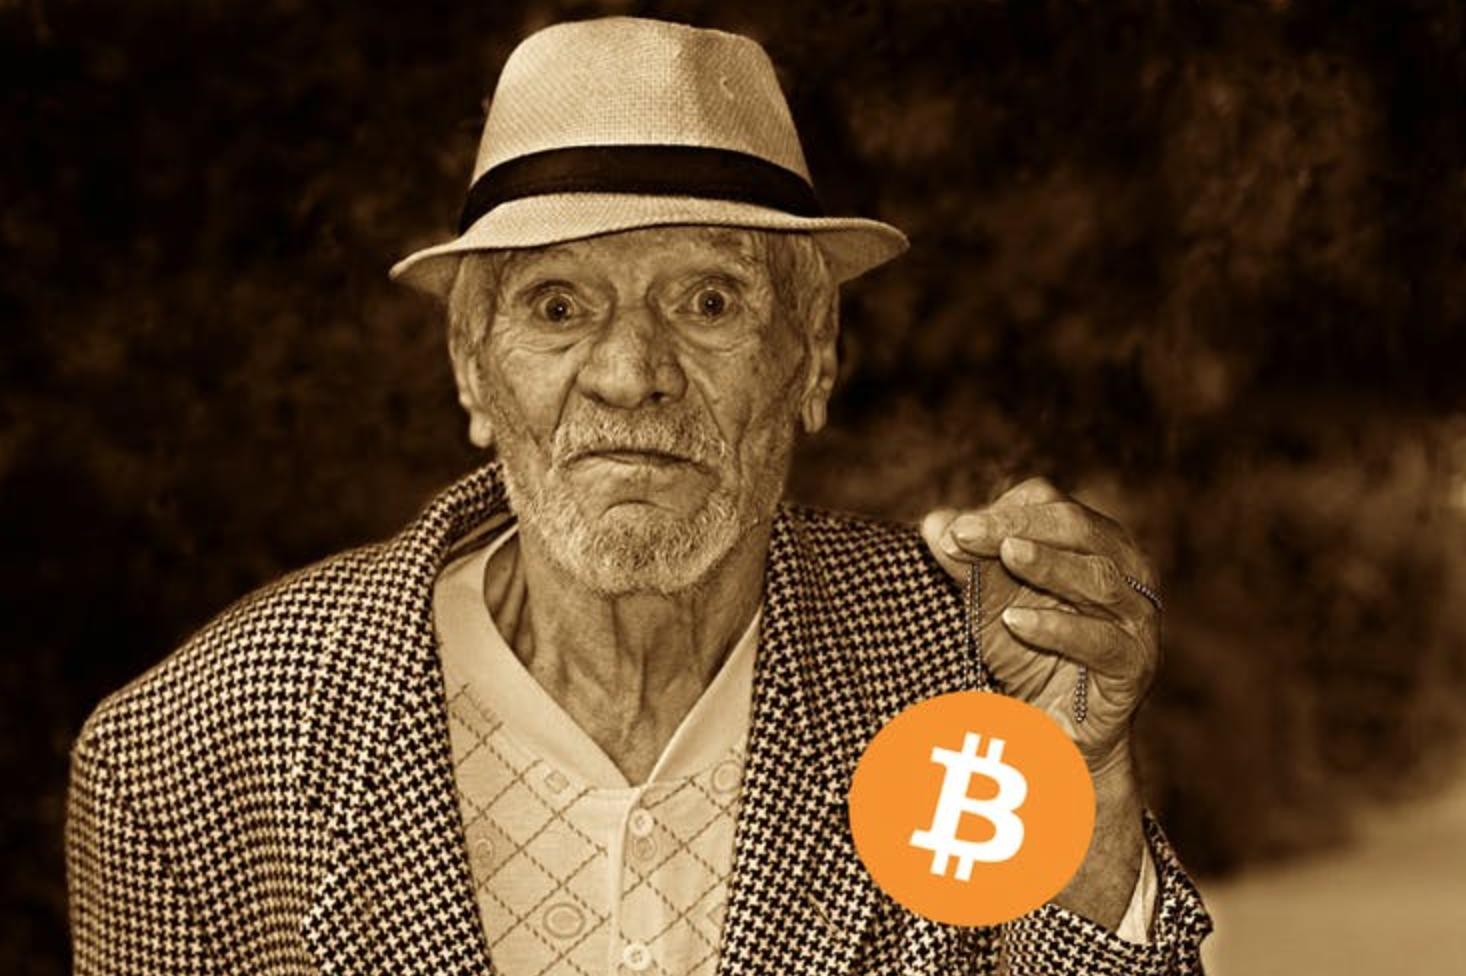 Oude Bitcoin bezitter ontwaakt